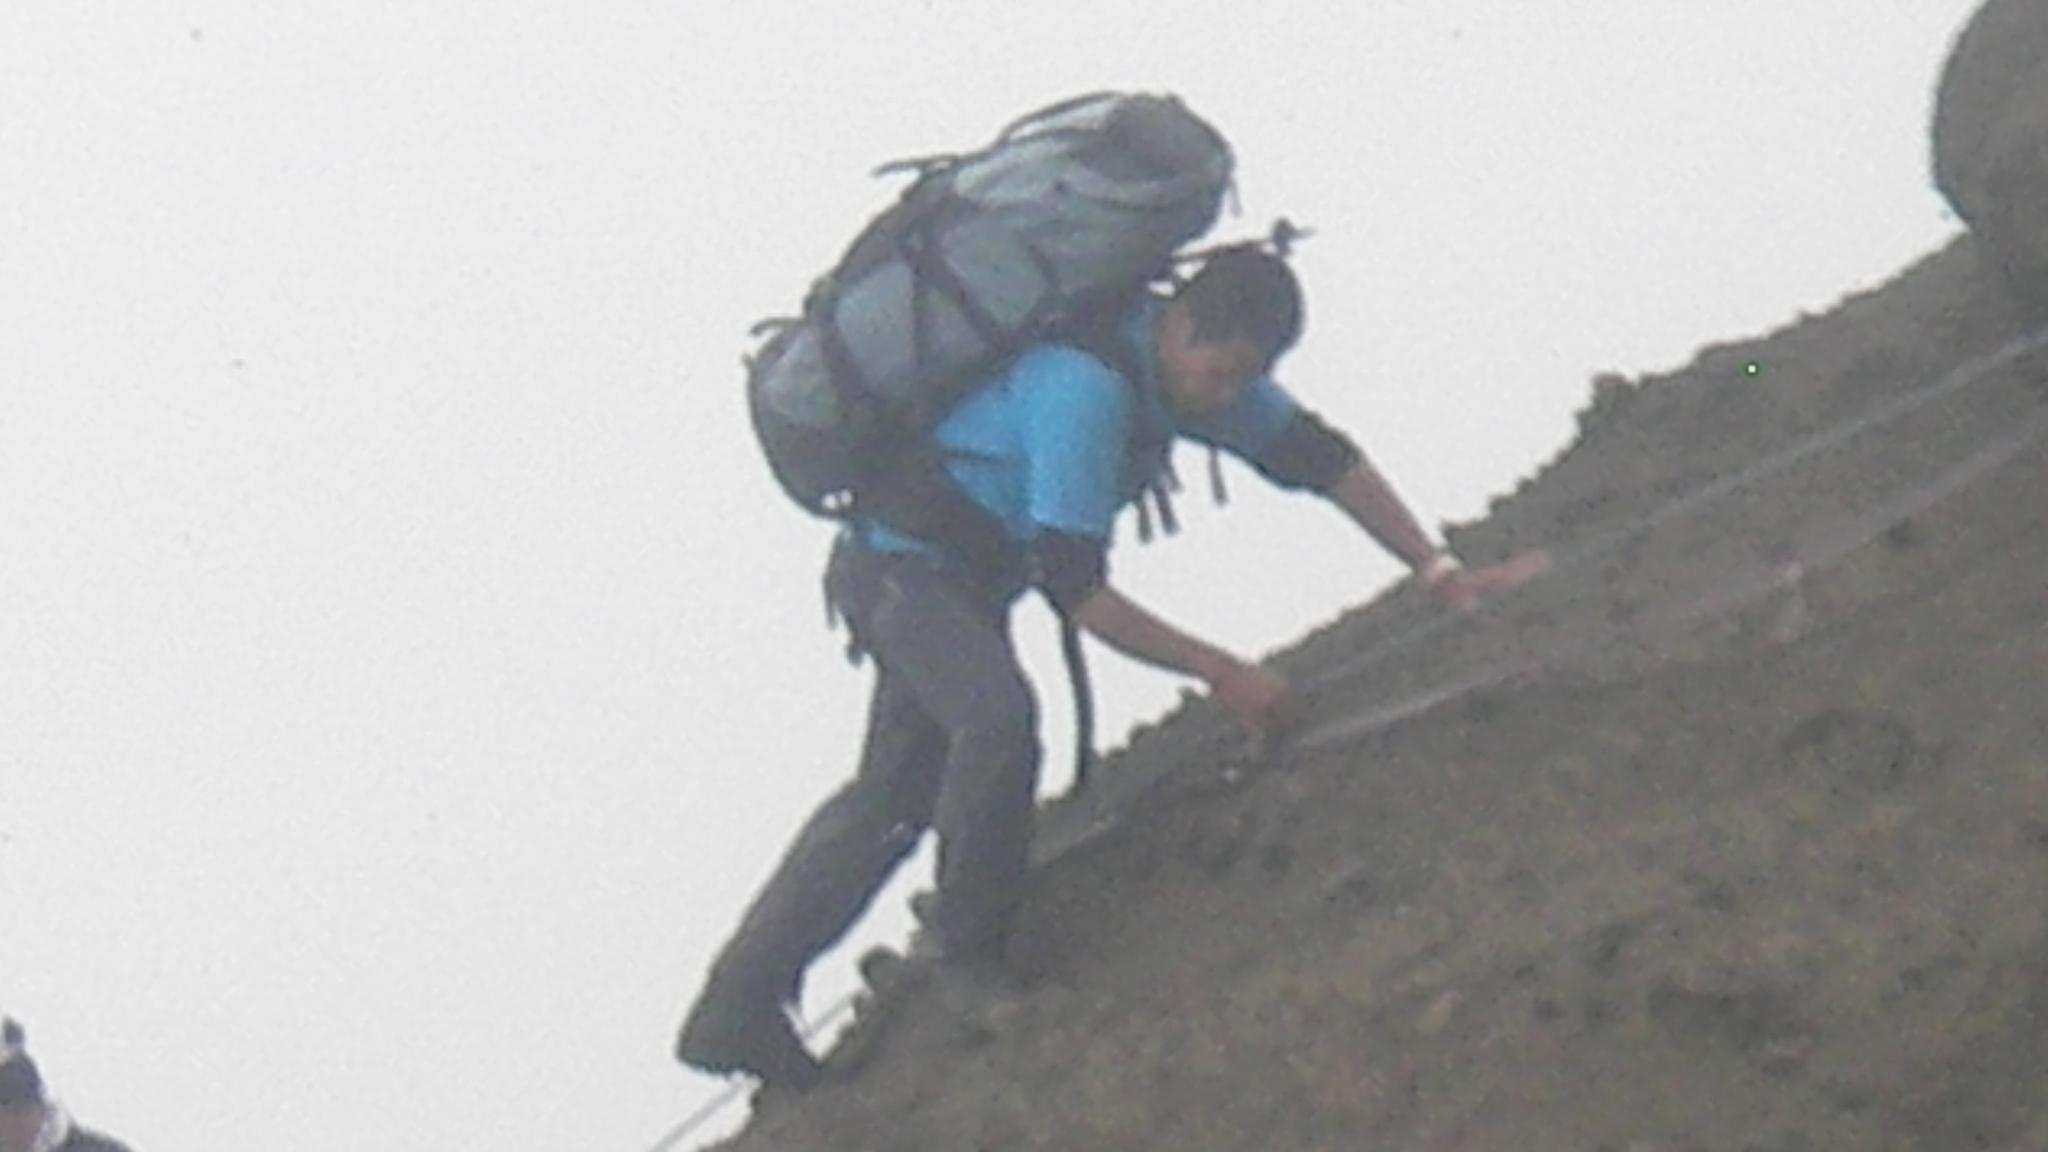 OBS-JALT2006-54日目:鋸岳、鬼ケ面山の狭い尾根を縦走